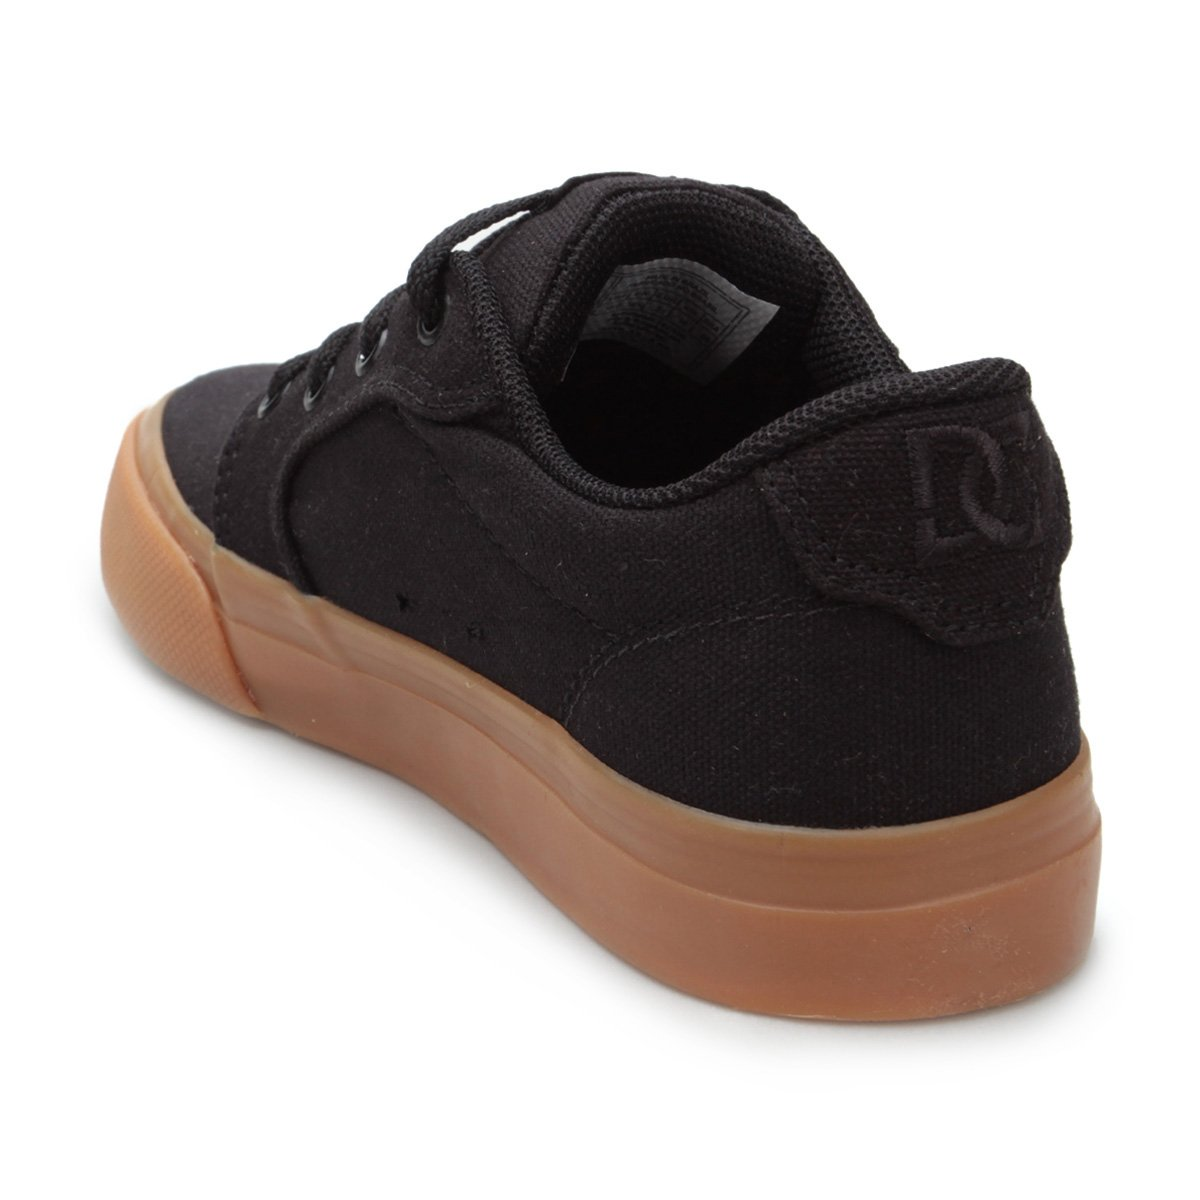 75e3fbd27a Tênis Infantil DC Shoes Anvil Tx La Masculino - Preto - Compre Agora ...